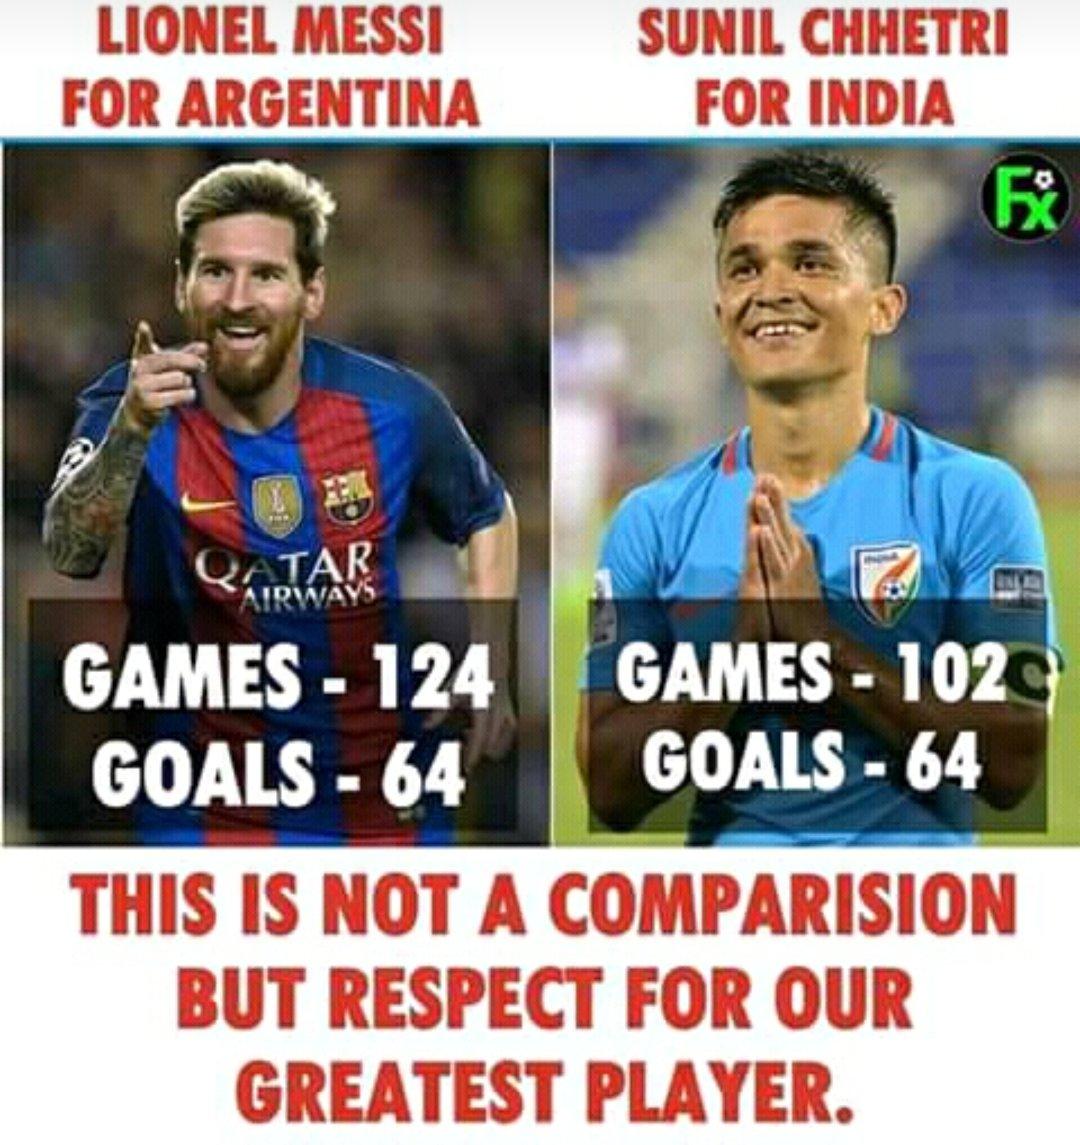 Indrajit Khatick on Twitter: